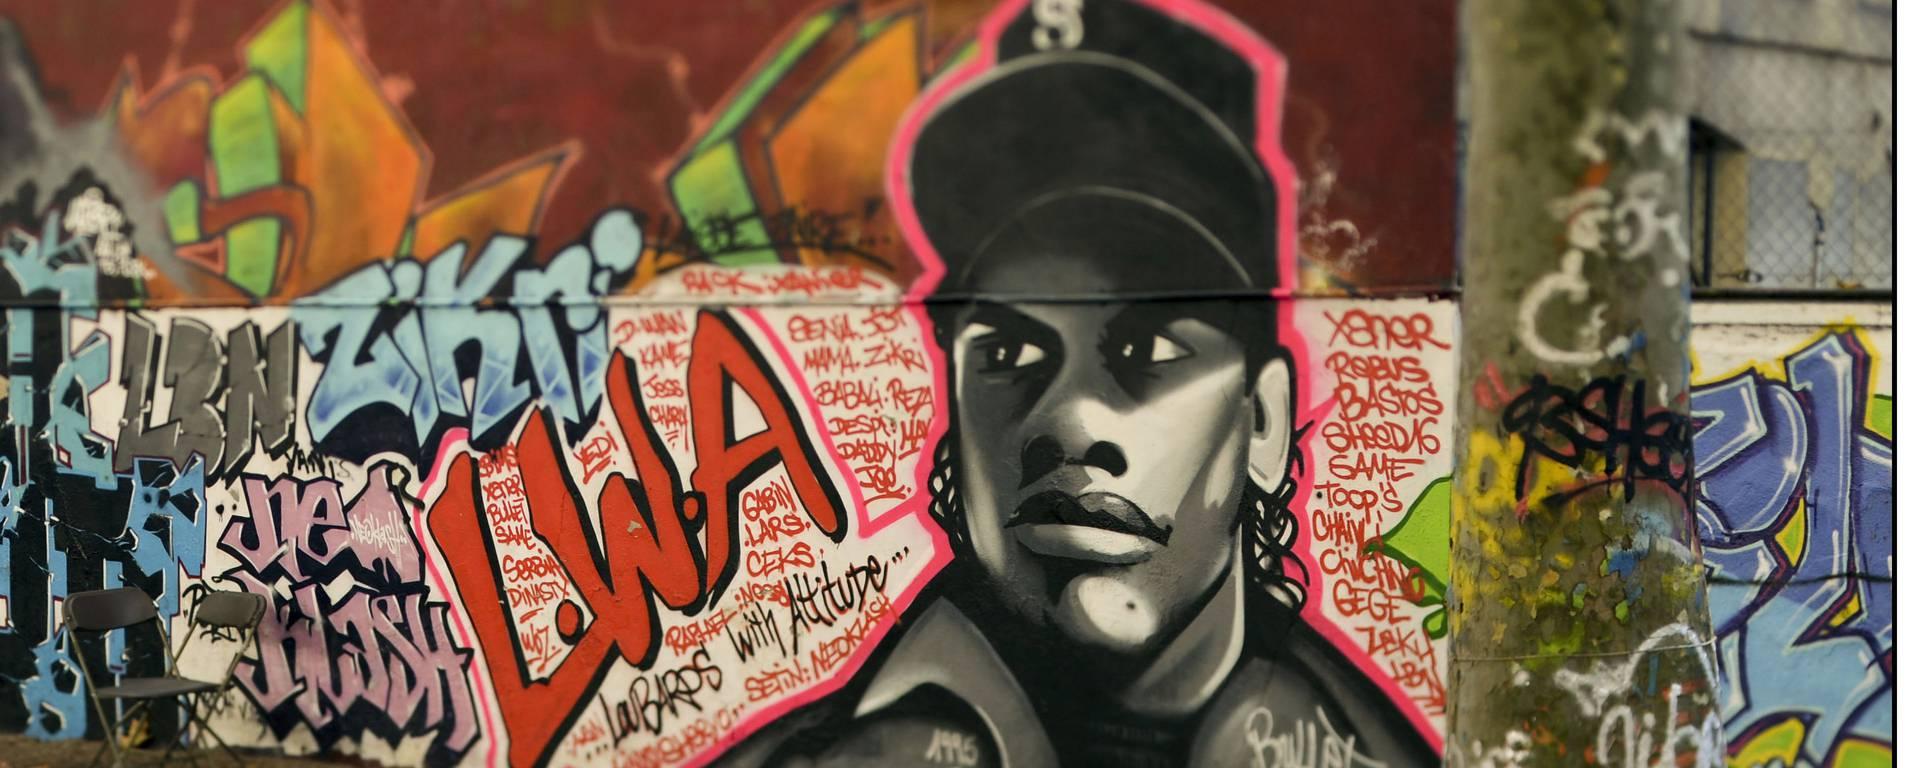 Street Art - © Willy Vainqueur et Bullet